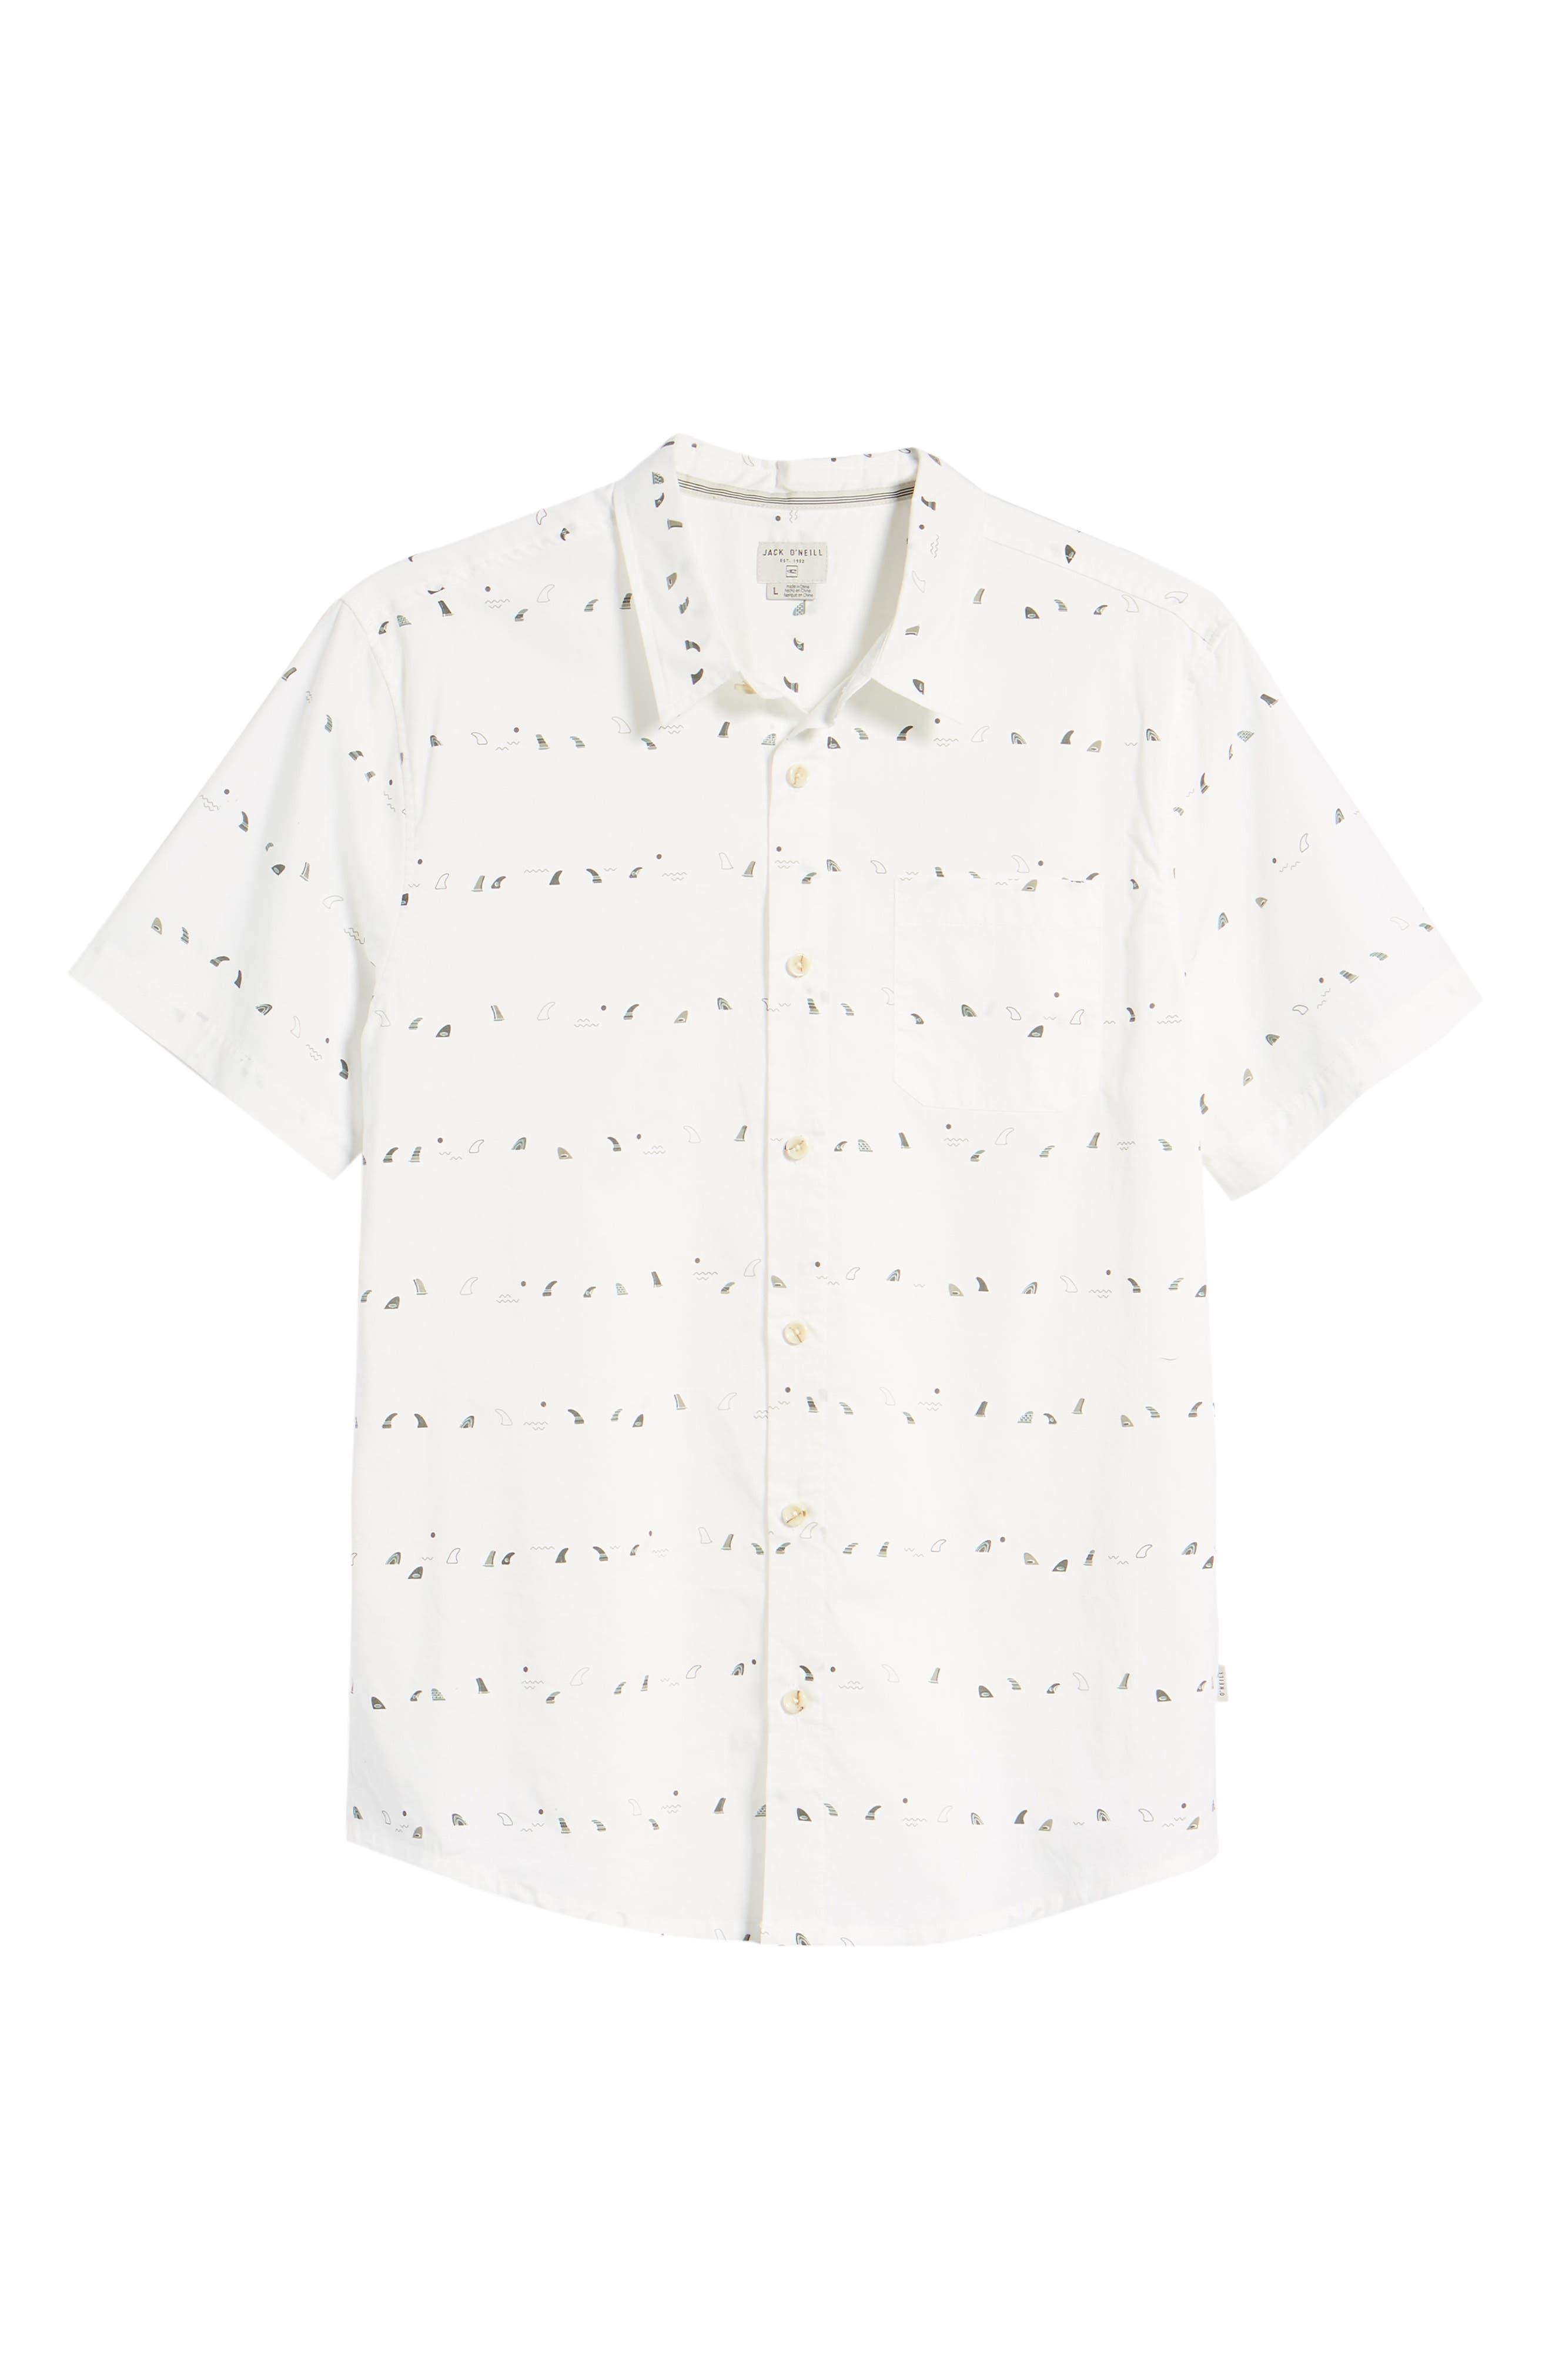 Single Fin Regular Fit Short Sleeve Sport Shirt,                             Alternate thumbnail 6, color,                             100